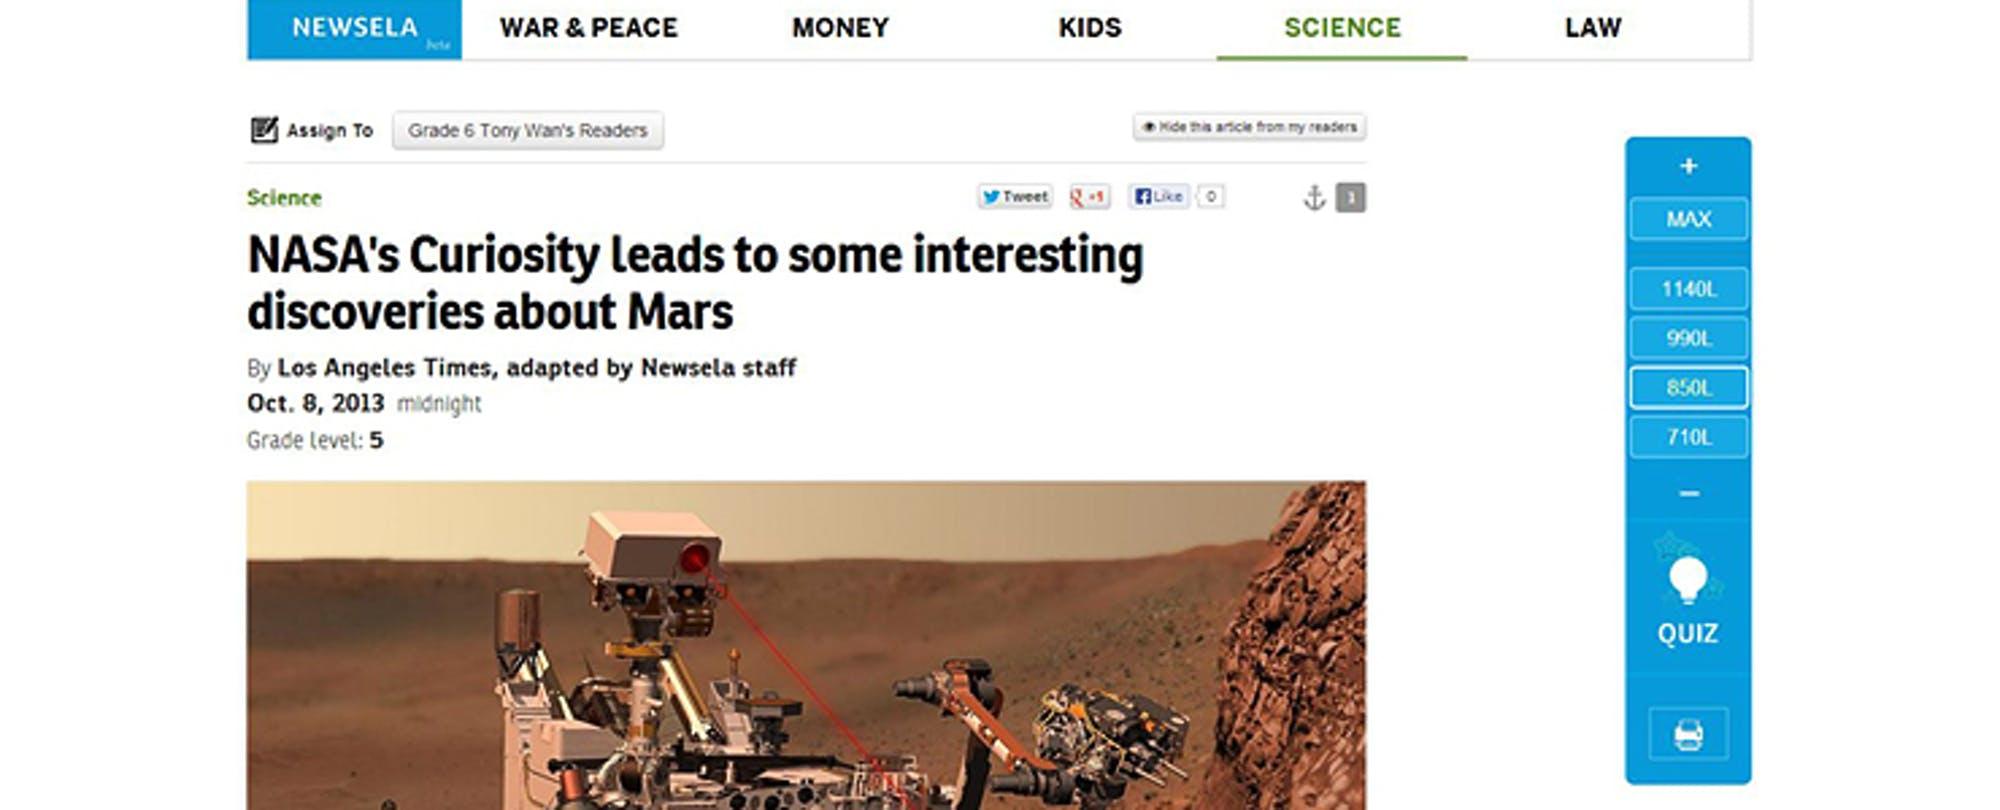 Newsela Raises $1.2M to Help Kids Read the News